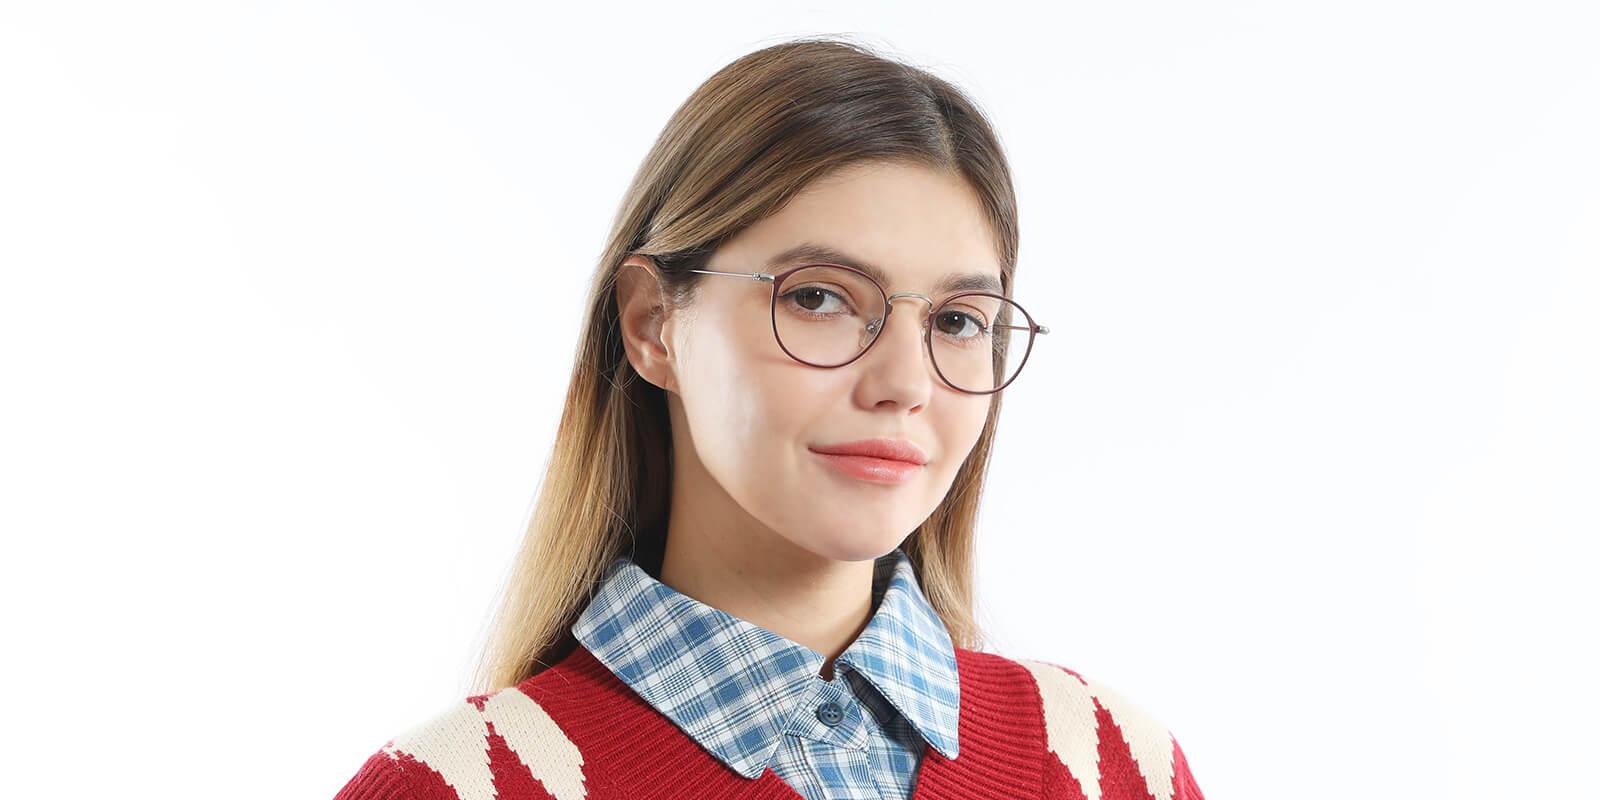 Delta-Round frame glasses with electroplated premium blue light blocking lenses